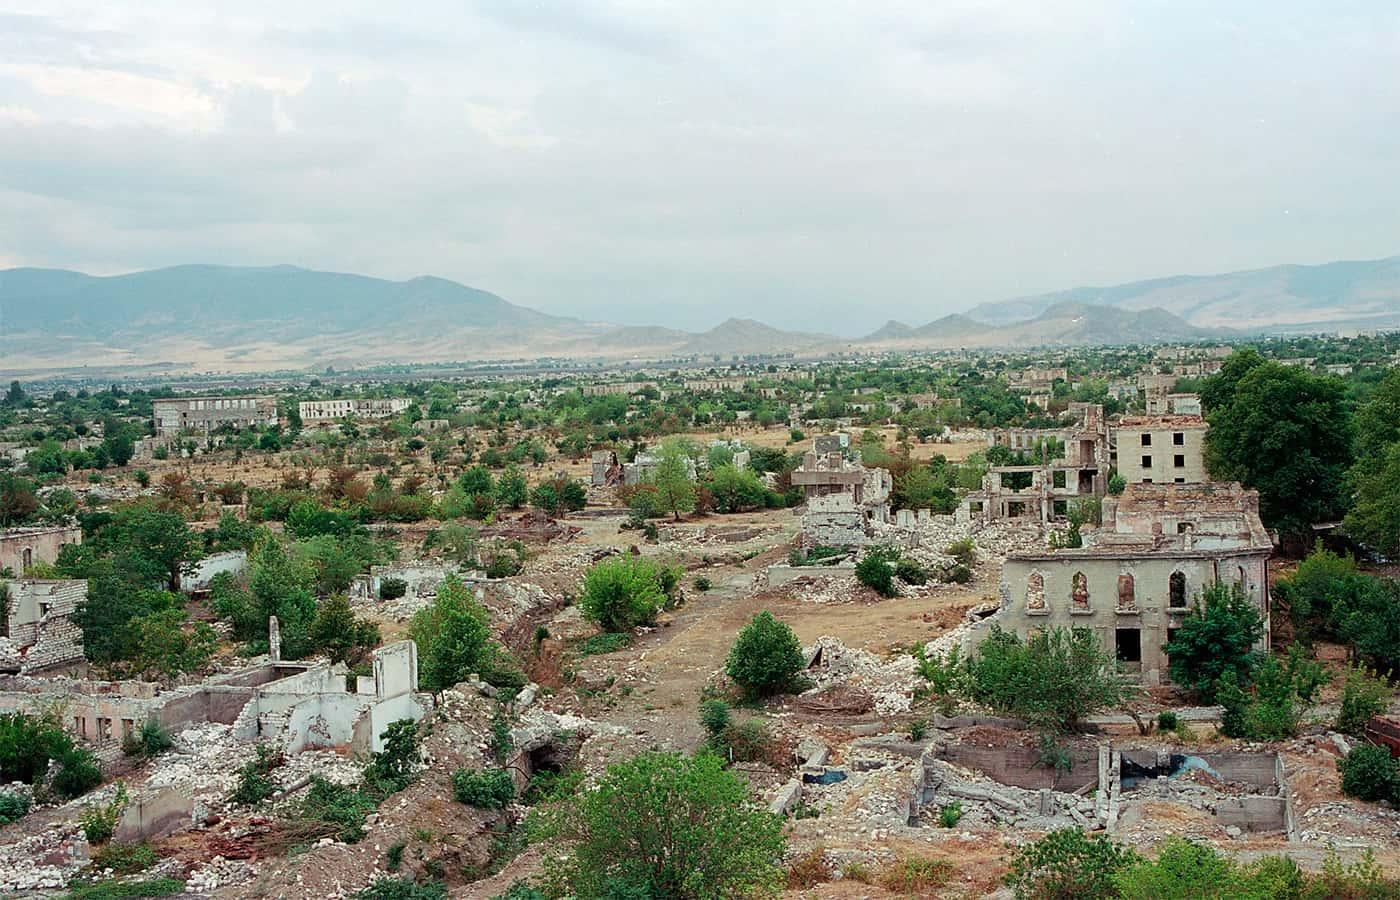 Руїни міста Агдам у Азербайджані